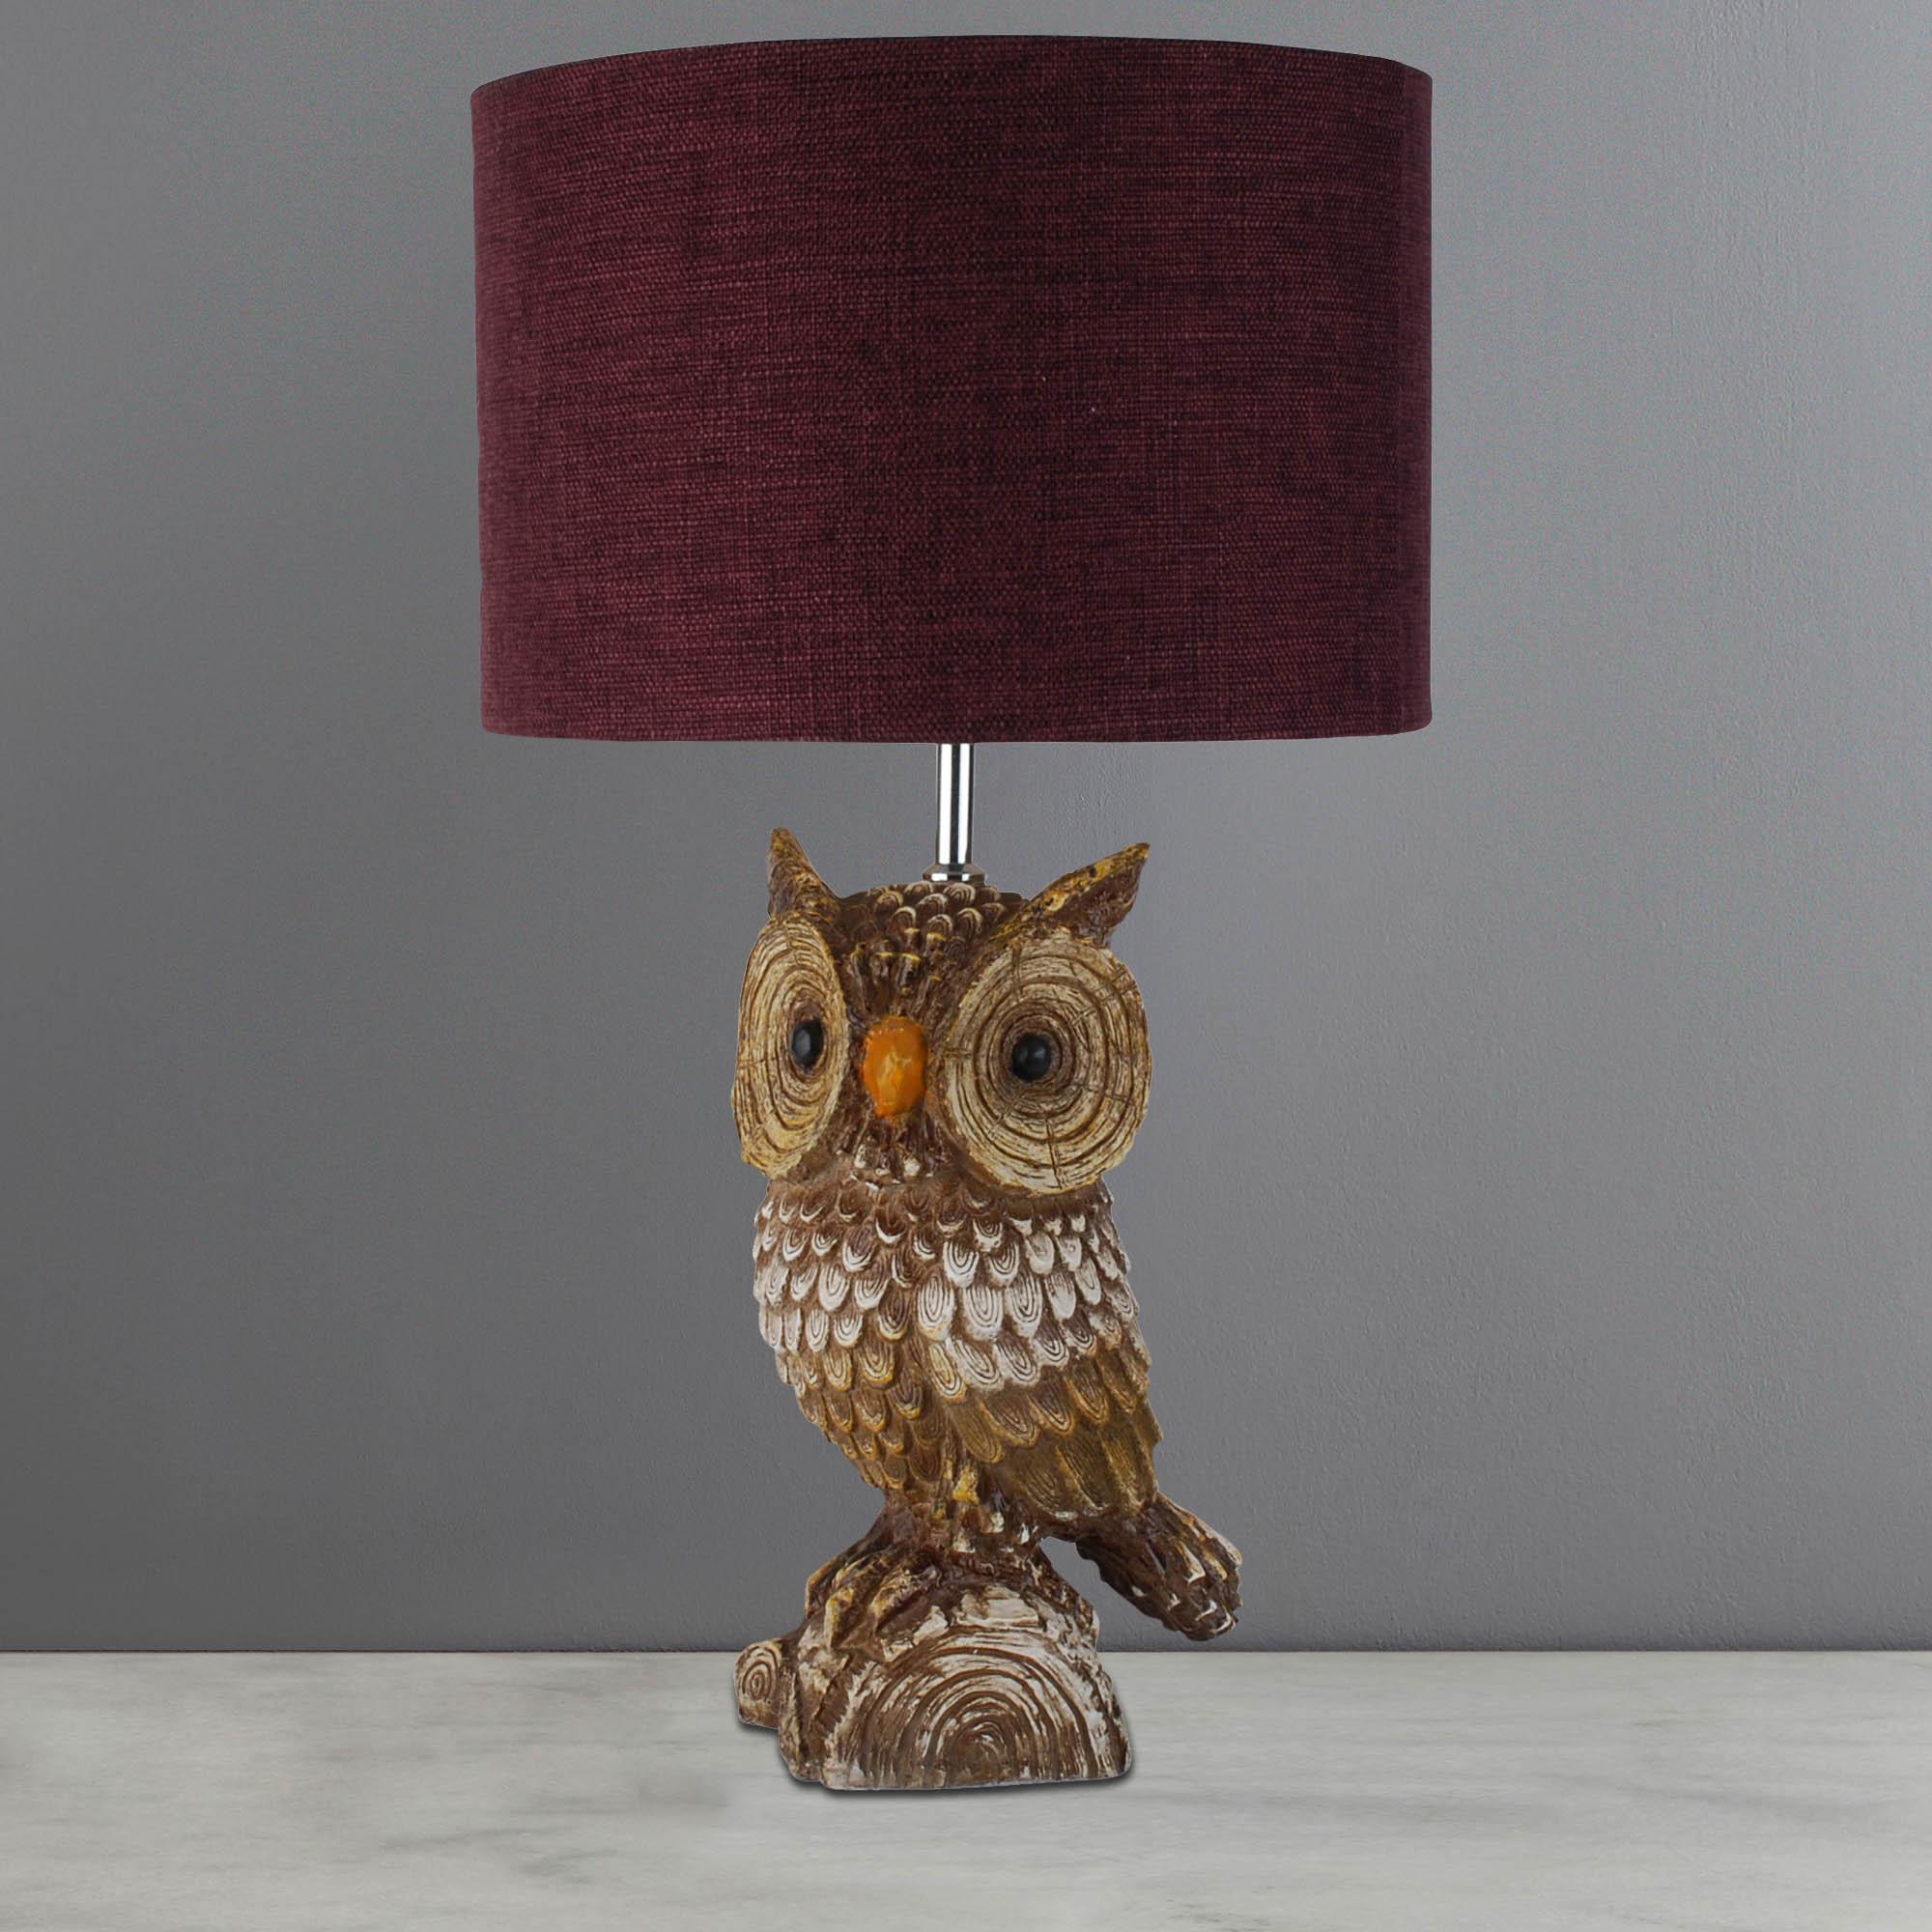 Owl Lamp capri rustic owl table lamp burgandy QYXULMC